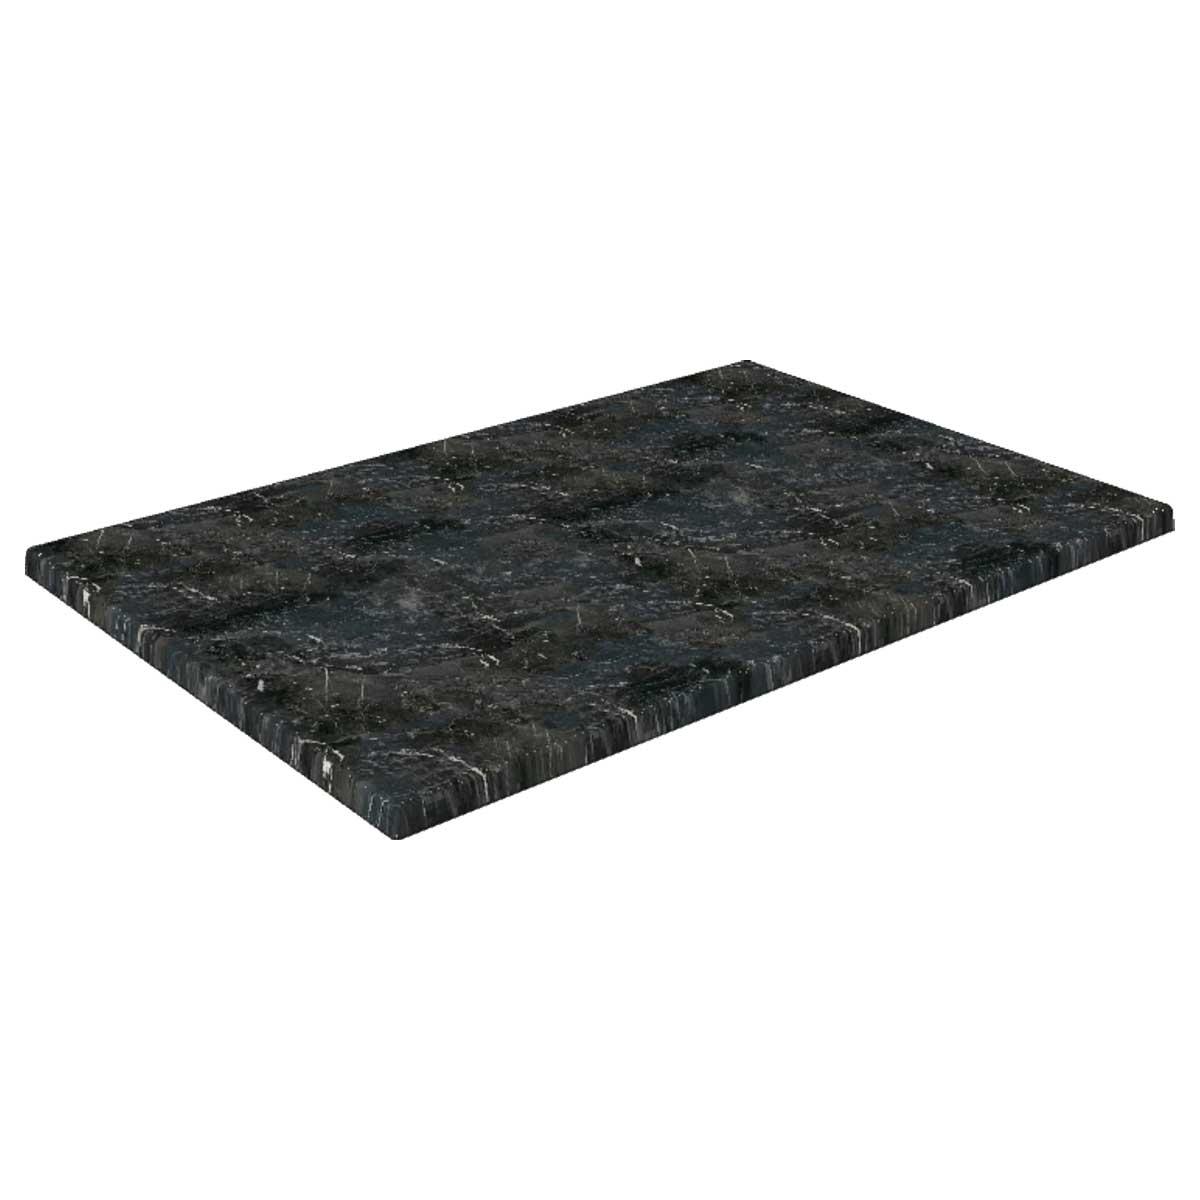 TICLA E120X80 210 - https://www.werzalit.com/fr/produit/plateau-de-table-classic-werzalit-e-100x60-210-marmor-marquina/